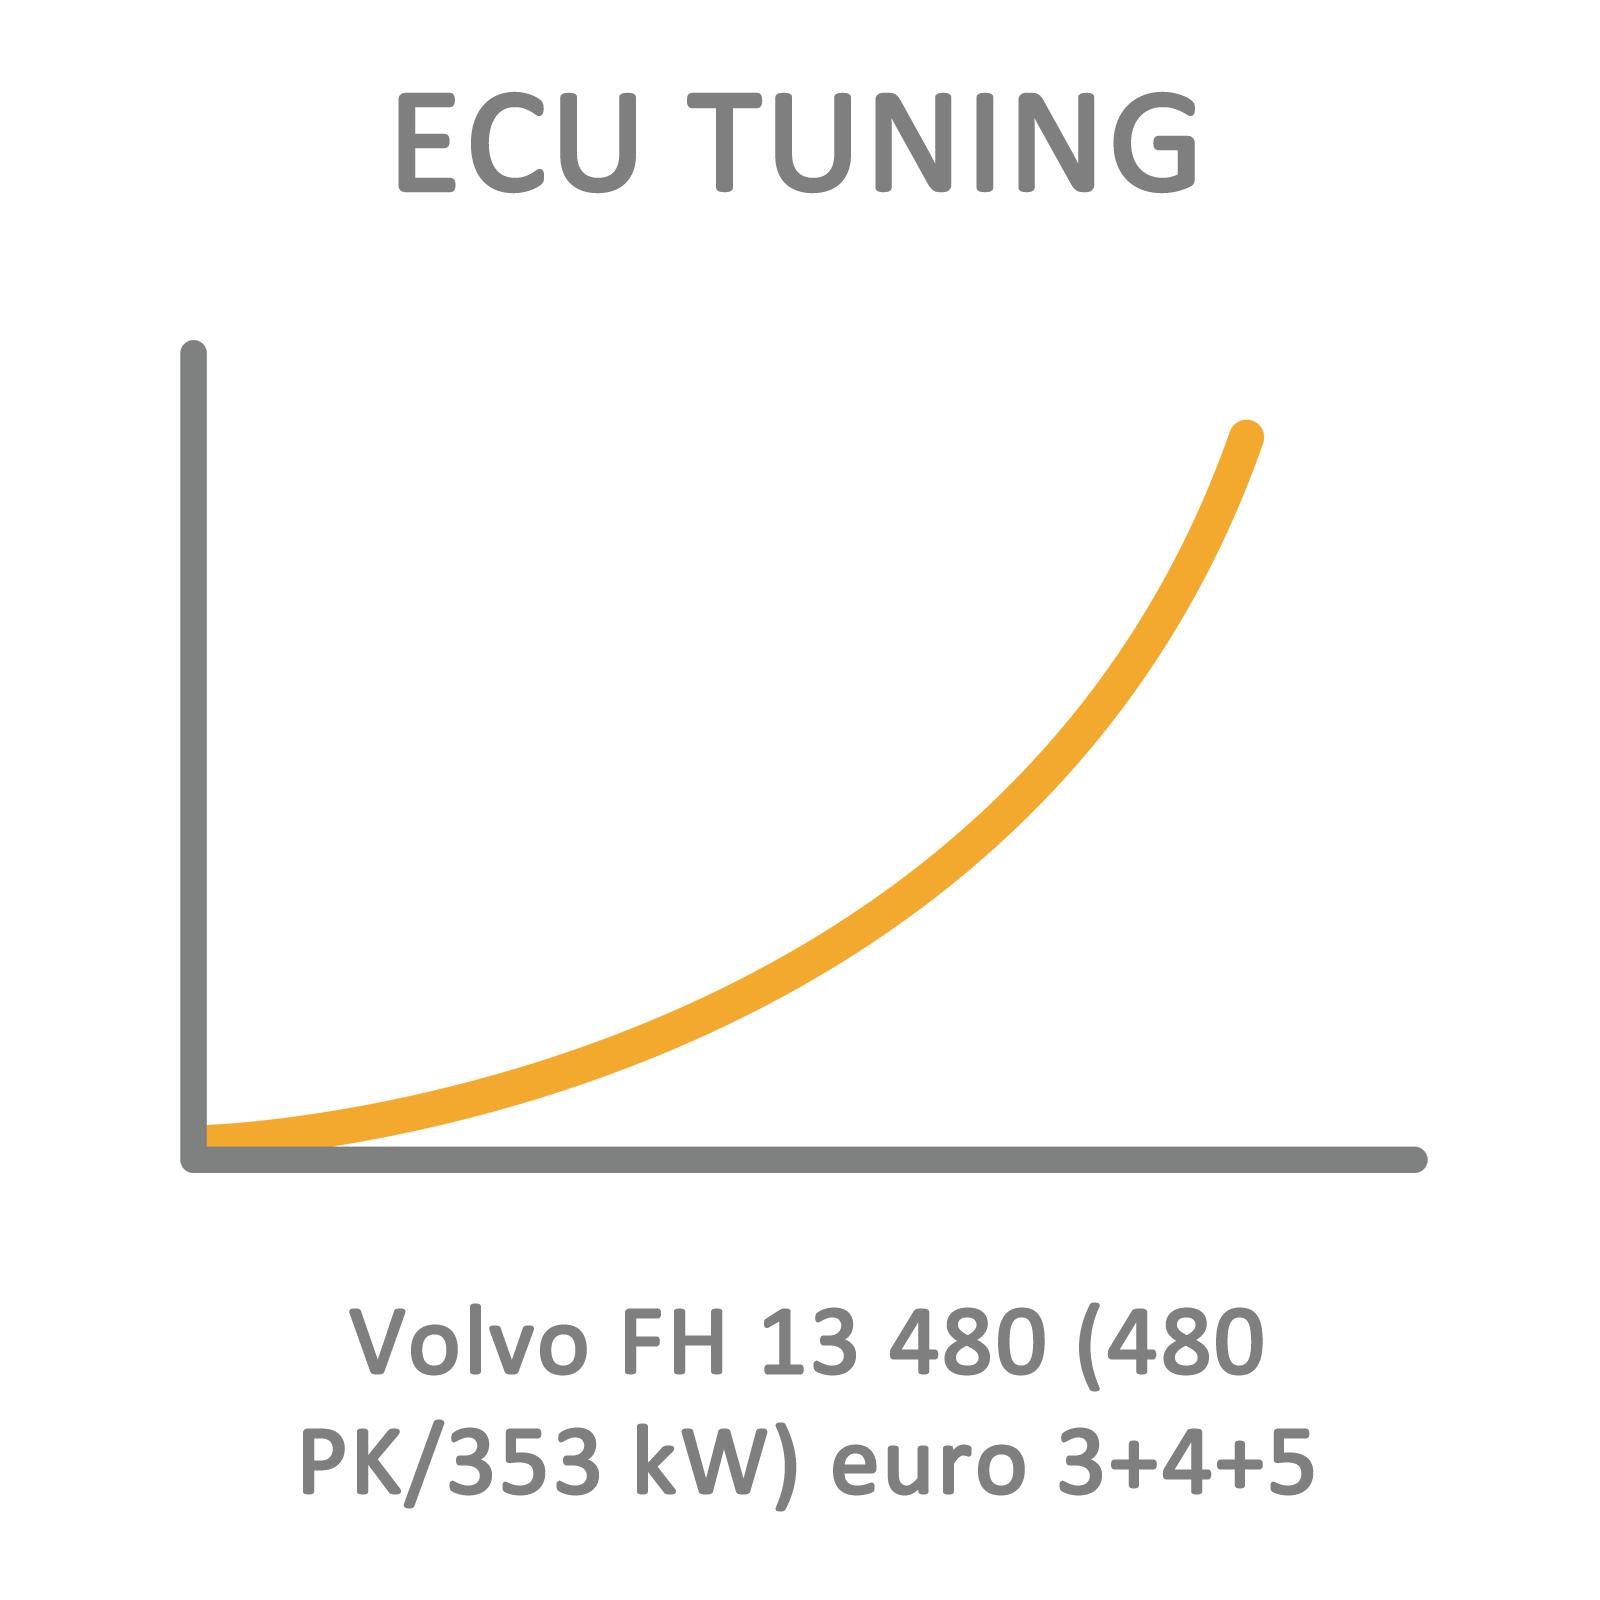 Volvo Fh 13 480 480 Pk 353 Kw Euro 3 4 5 Ecu Tuning